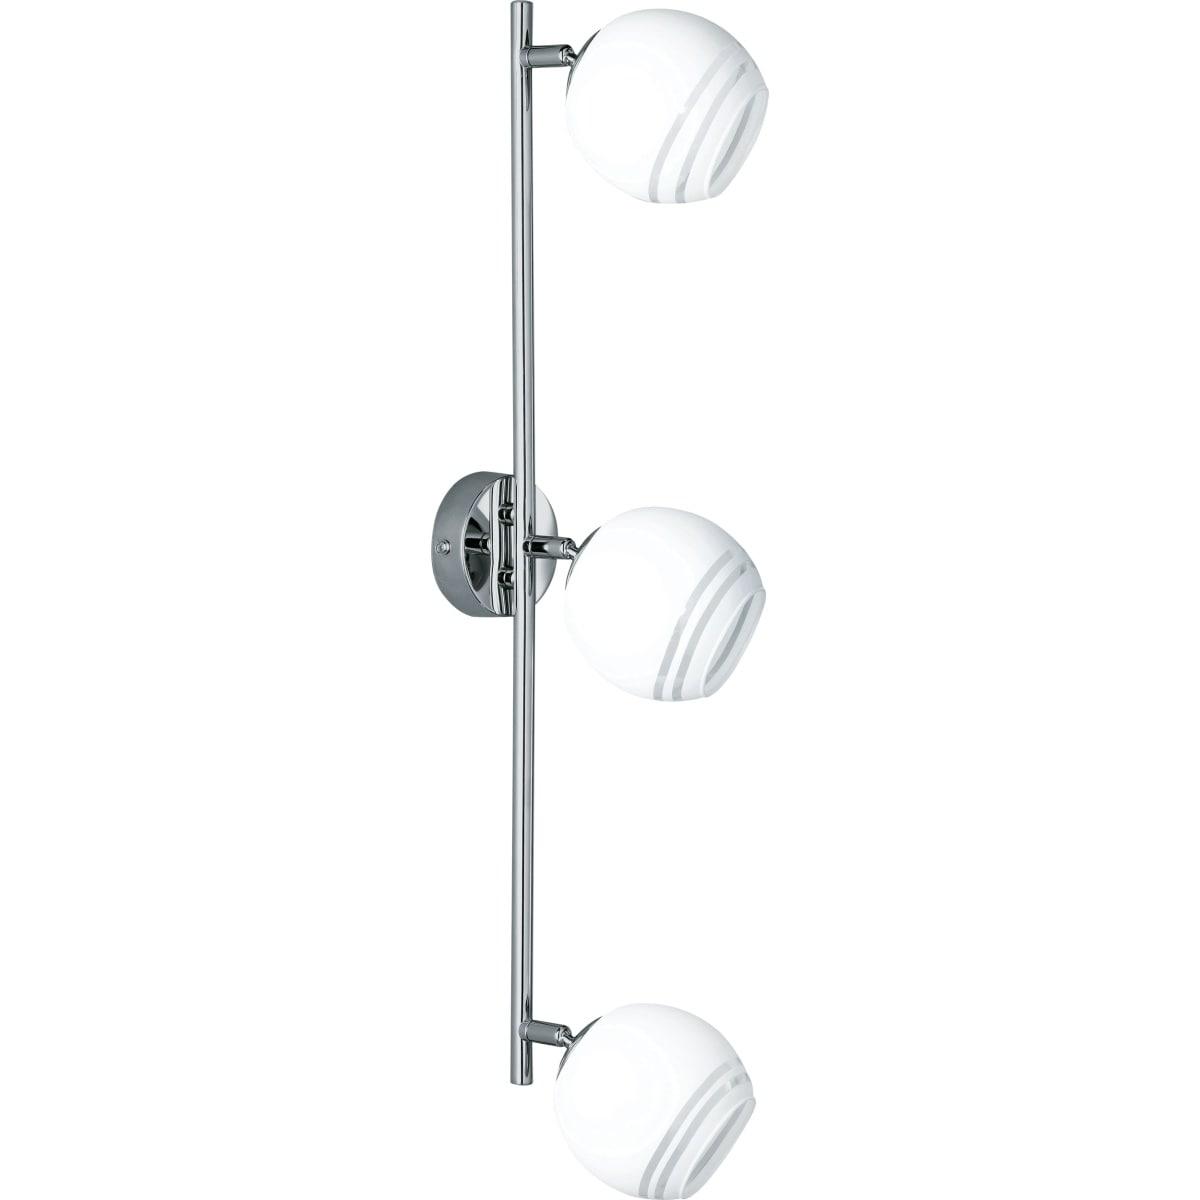 3er spot wei deckenlampen lampen dekoration m bel boss. Black Bedroom Furniture Sets. Home Design Ideas